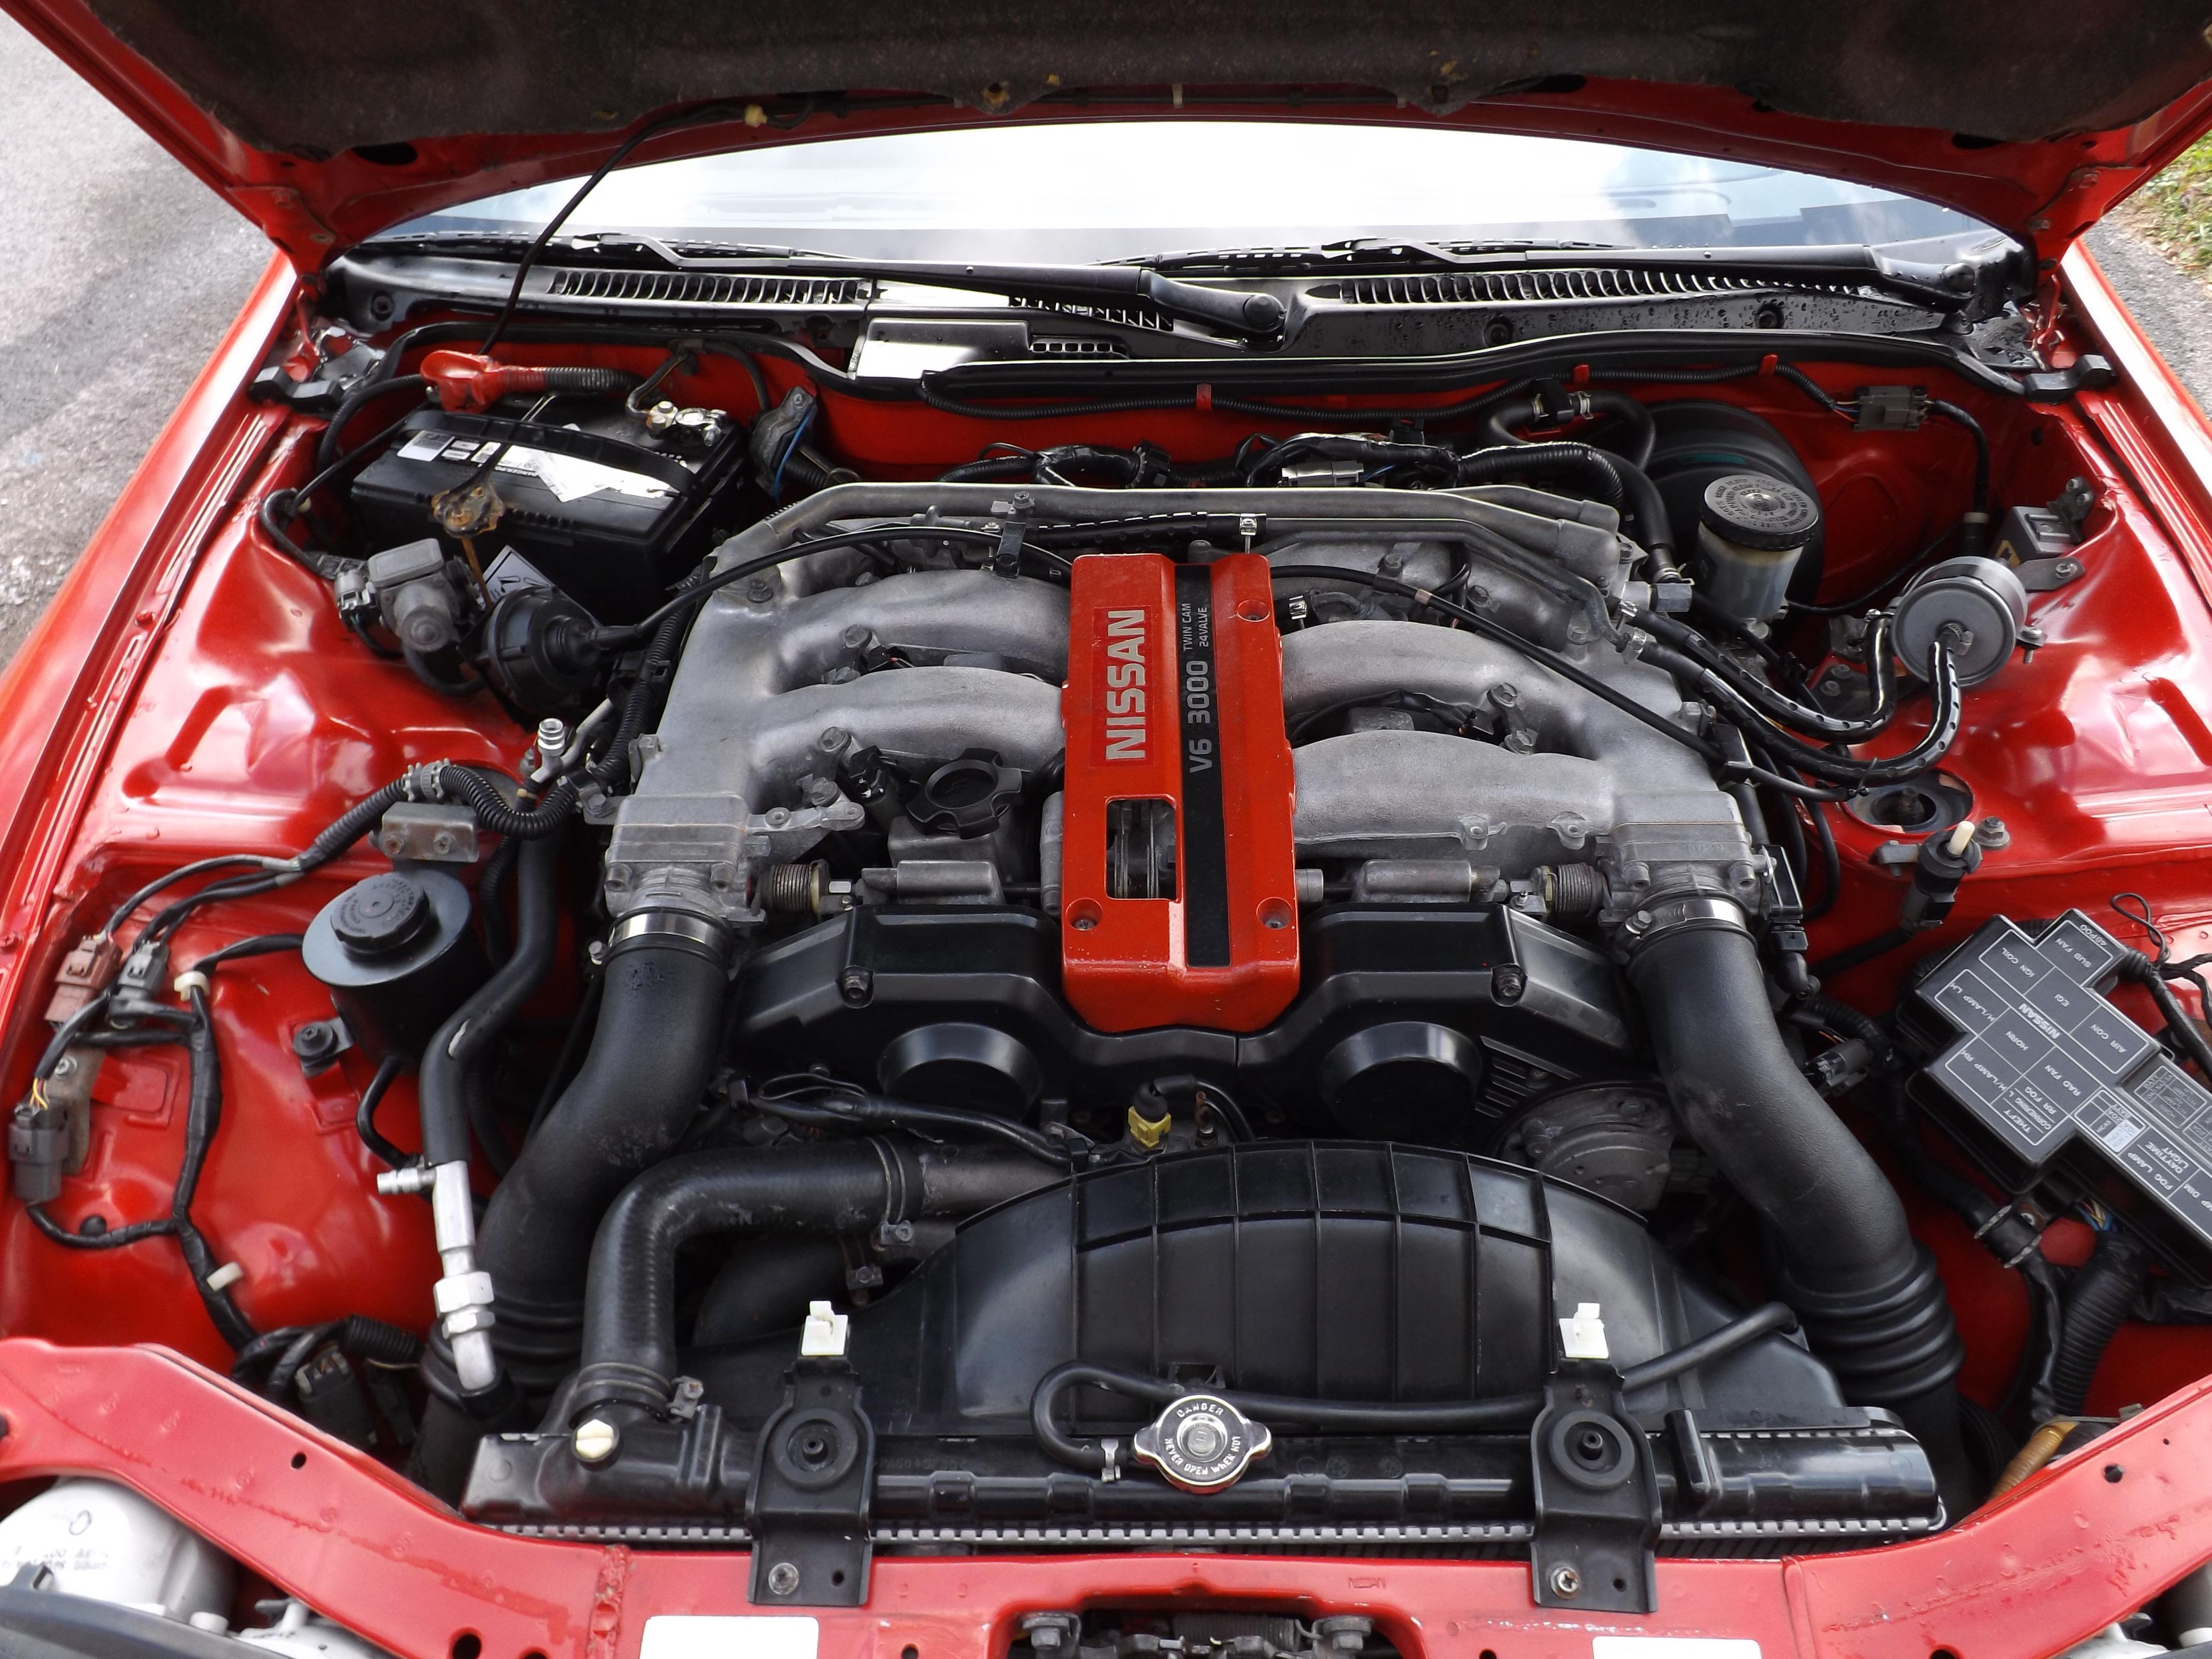 1990 Nissan 300zx Engine Diagram Great Design Of Wiring Schematic Tt Get Free Image 1986 1994 Vacuum Diagrams